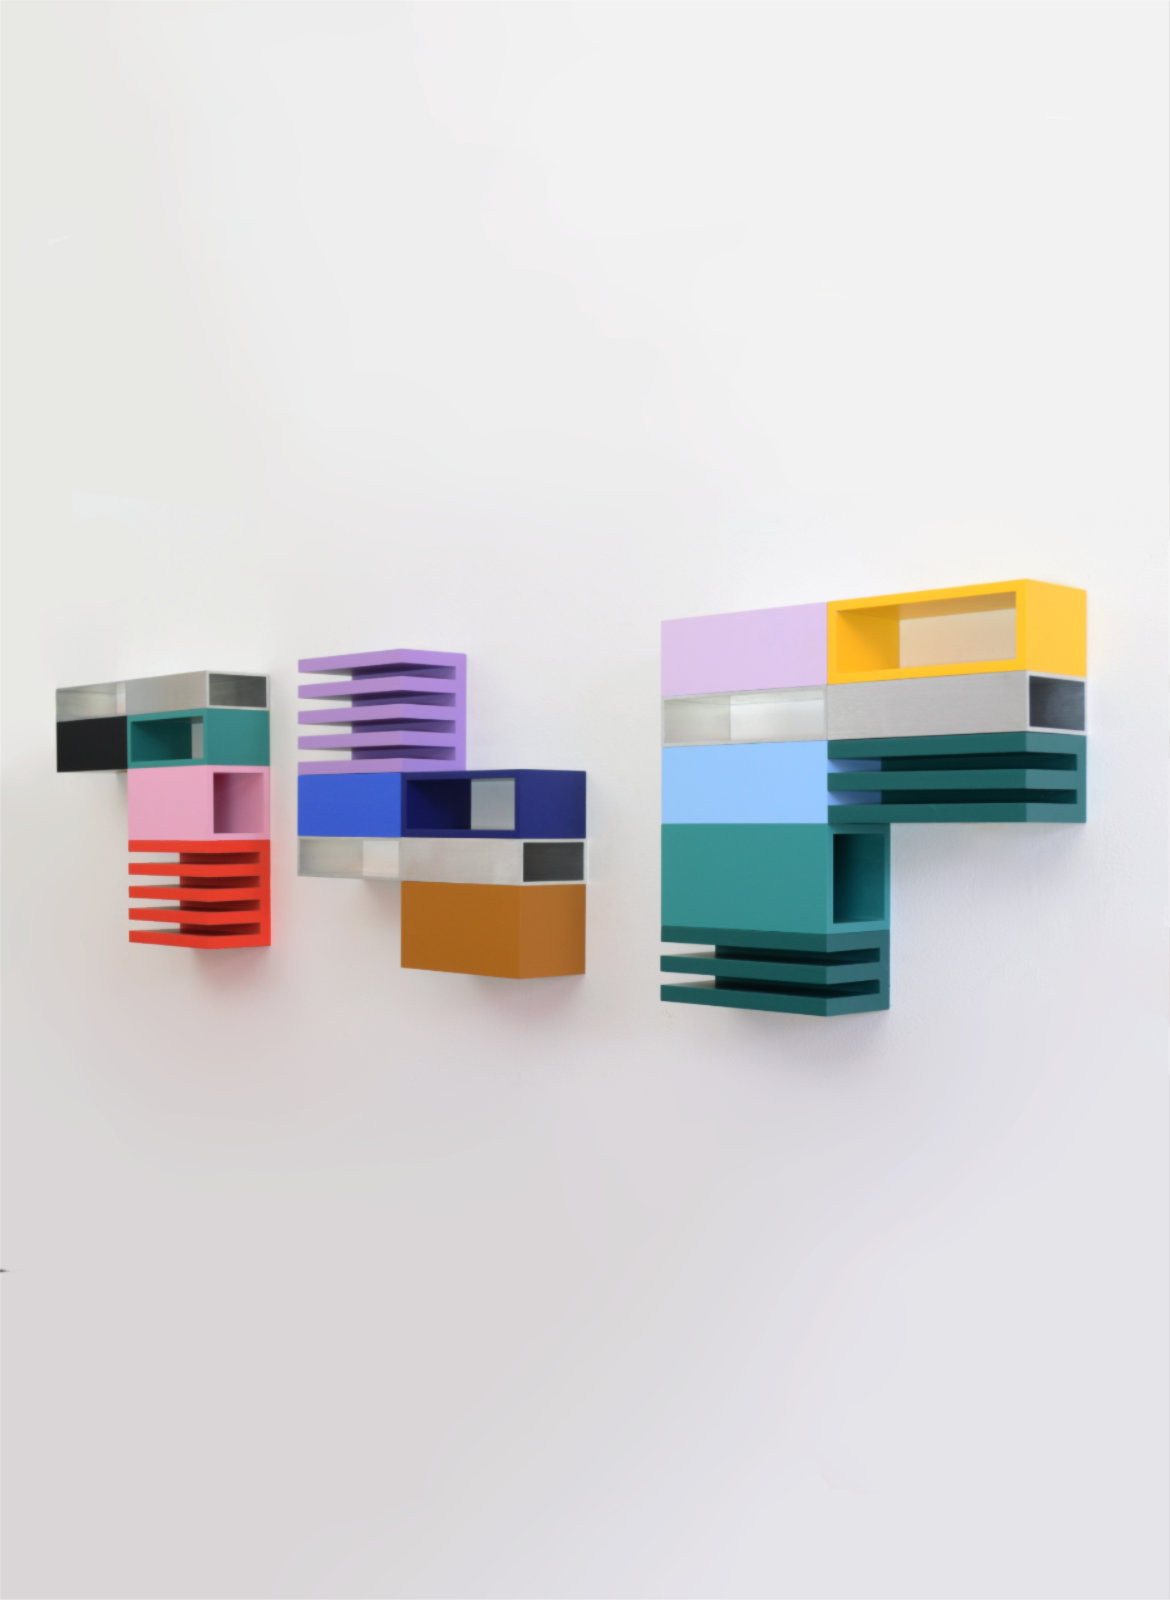 wall object LMNM